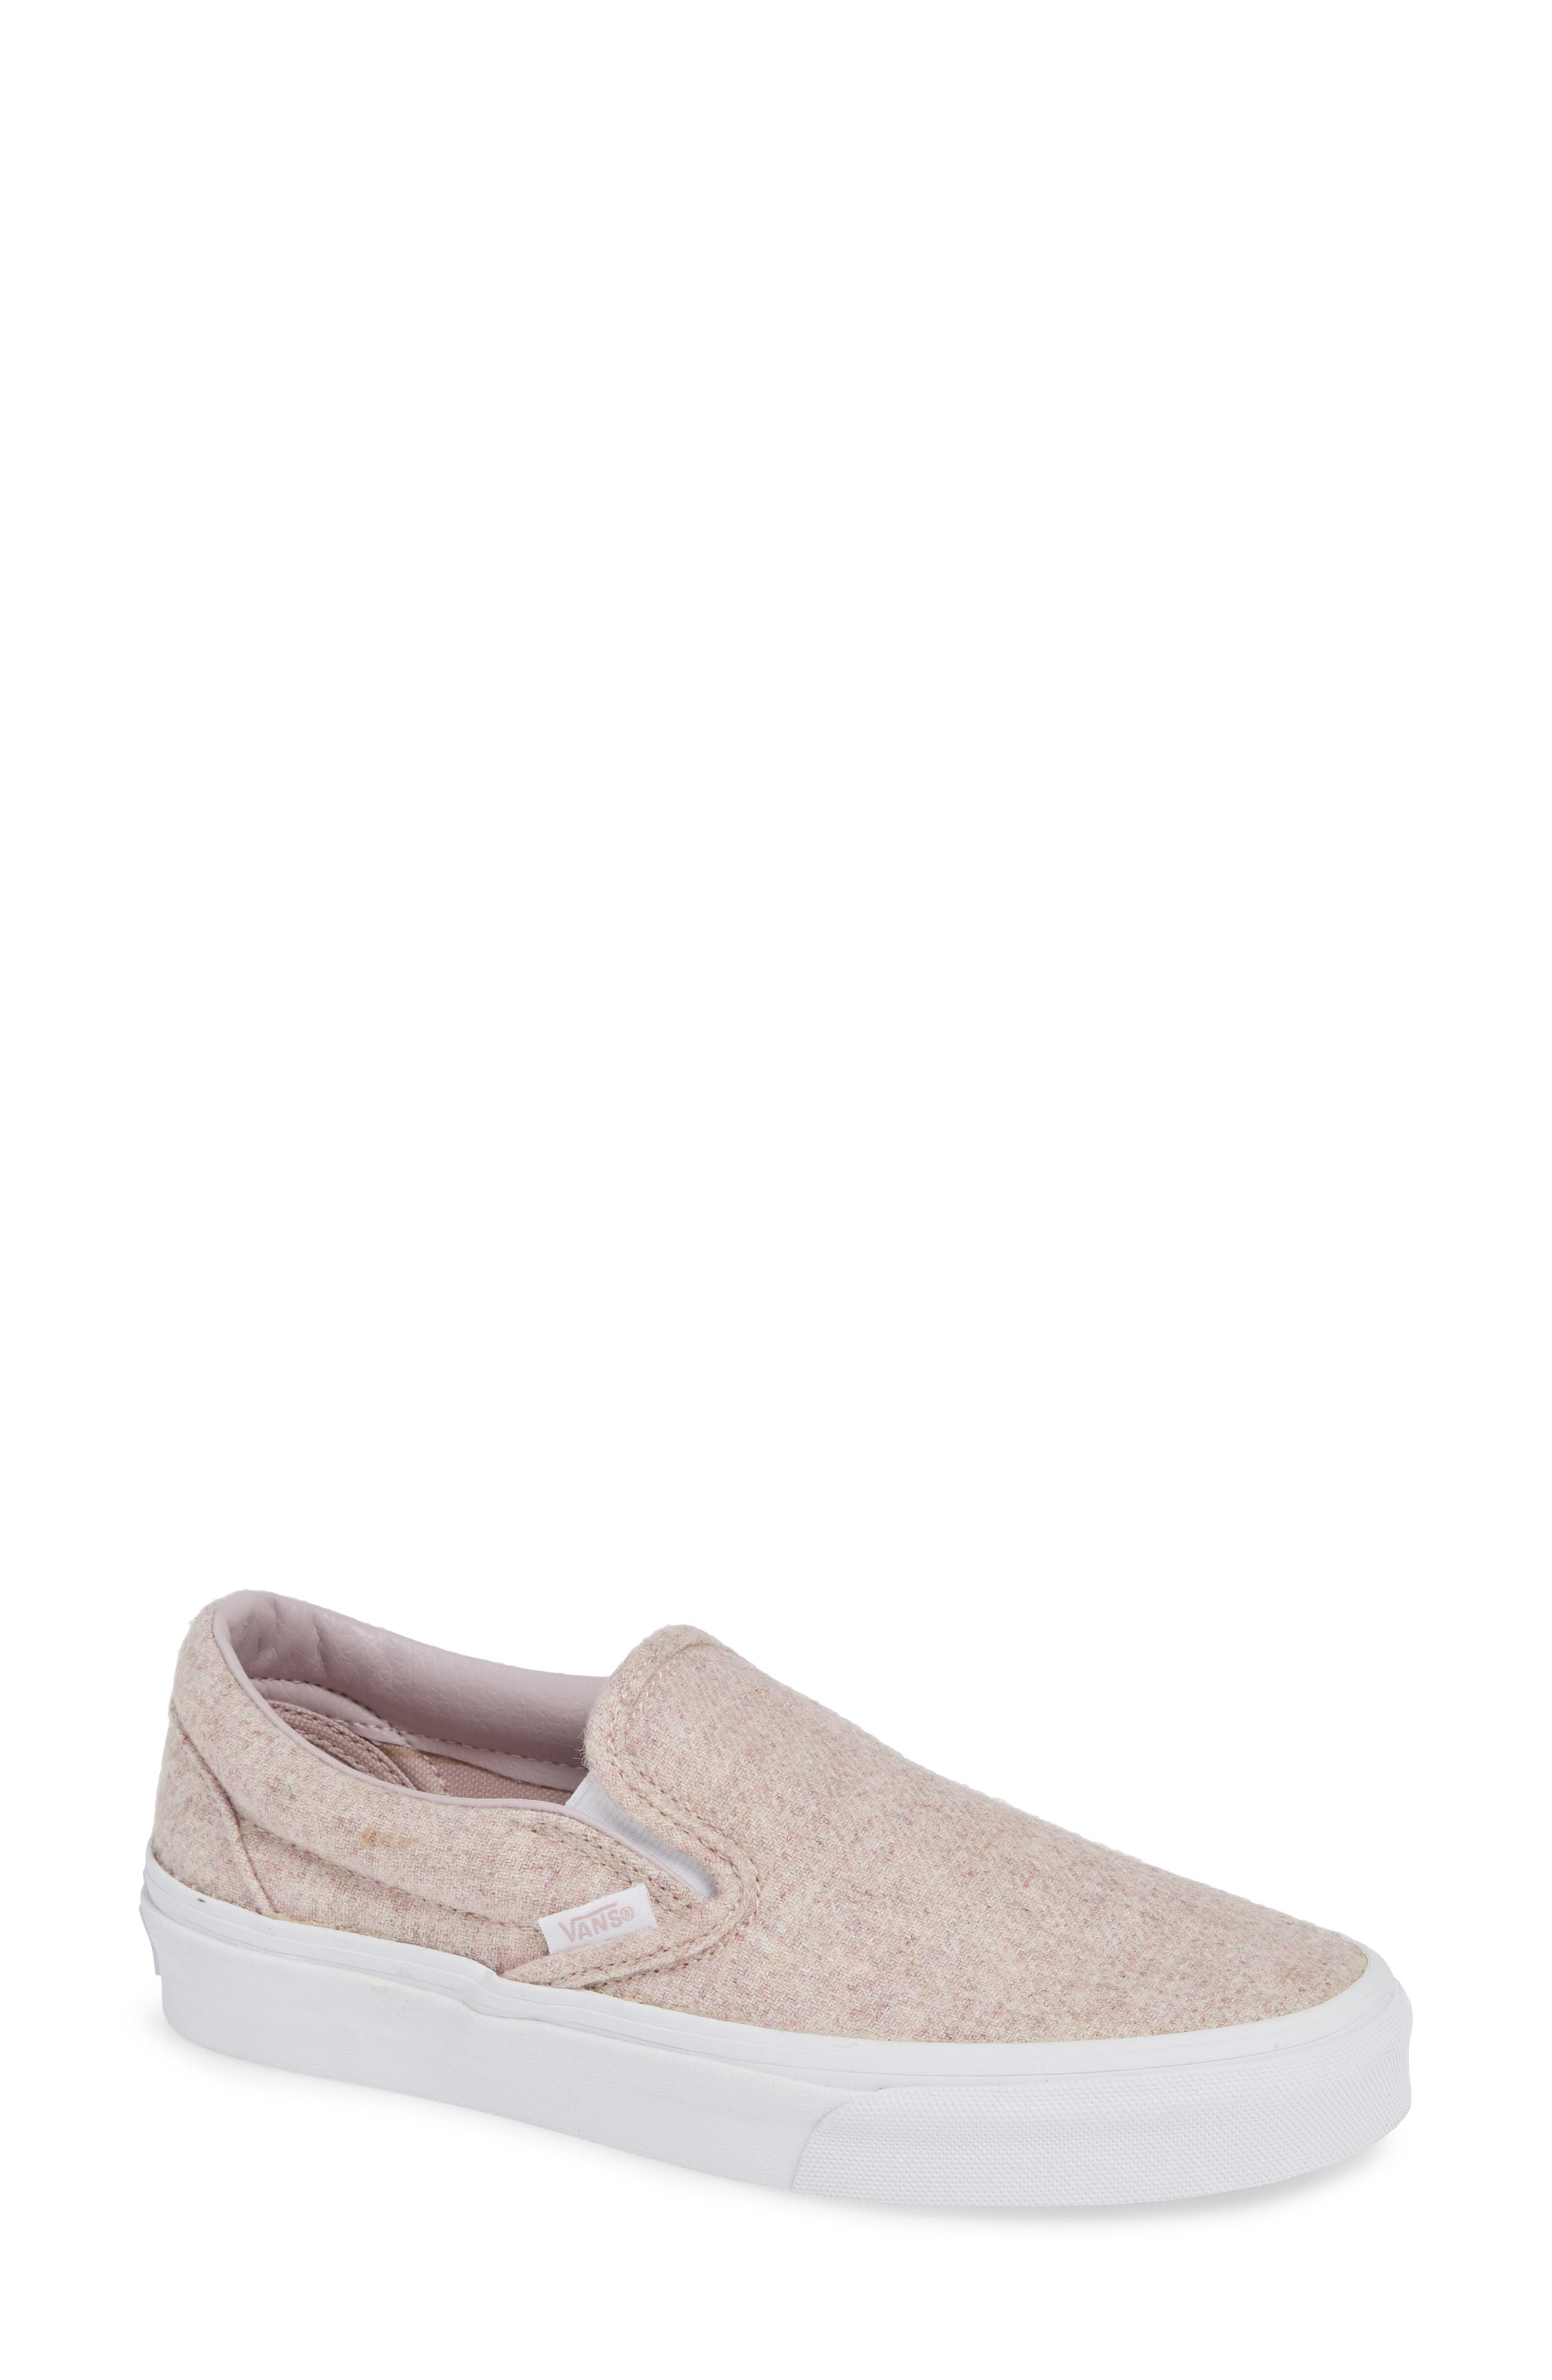 Classic Slip-On Sneaker,                         Main,                         color, VIOLET ICE/ TRUE WHITE